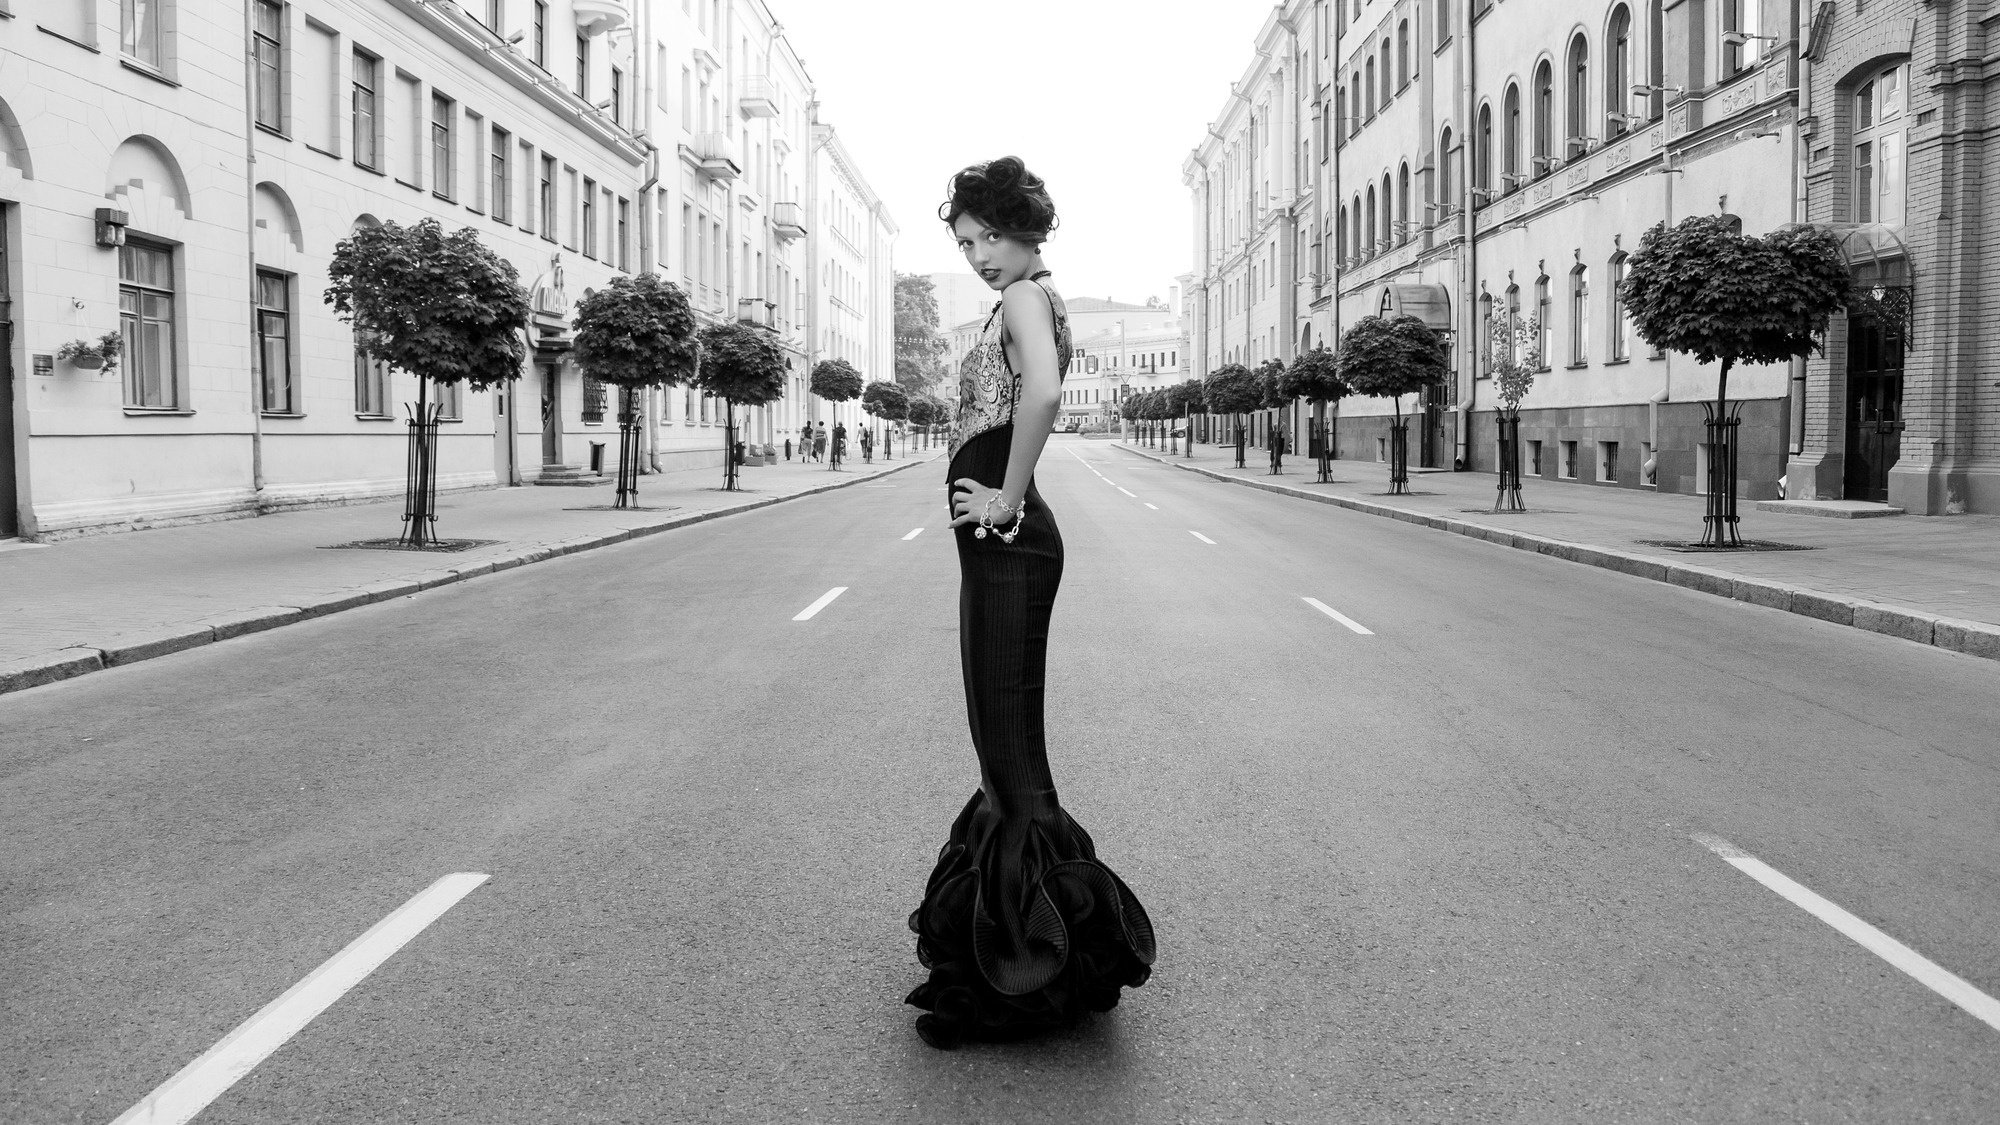 Photoshop e Lightroom-Bianco e nero mozzafiato